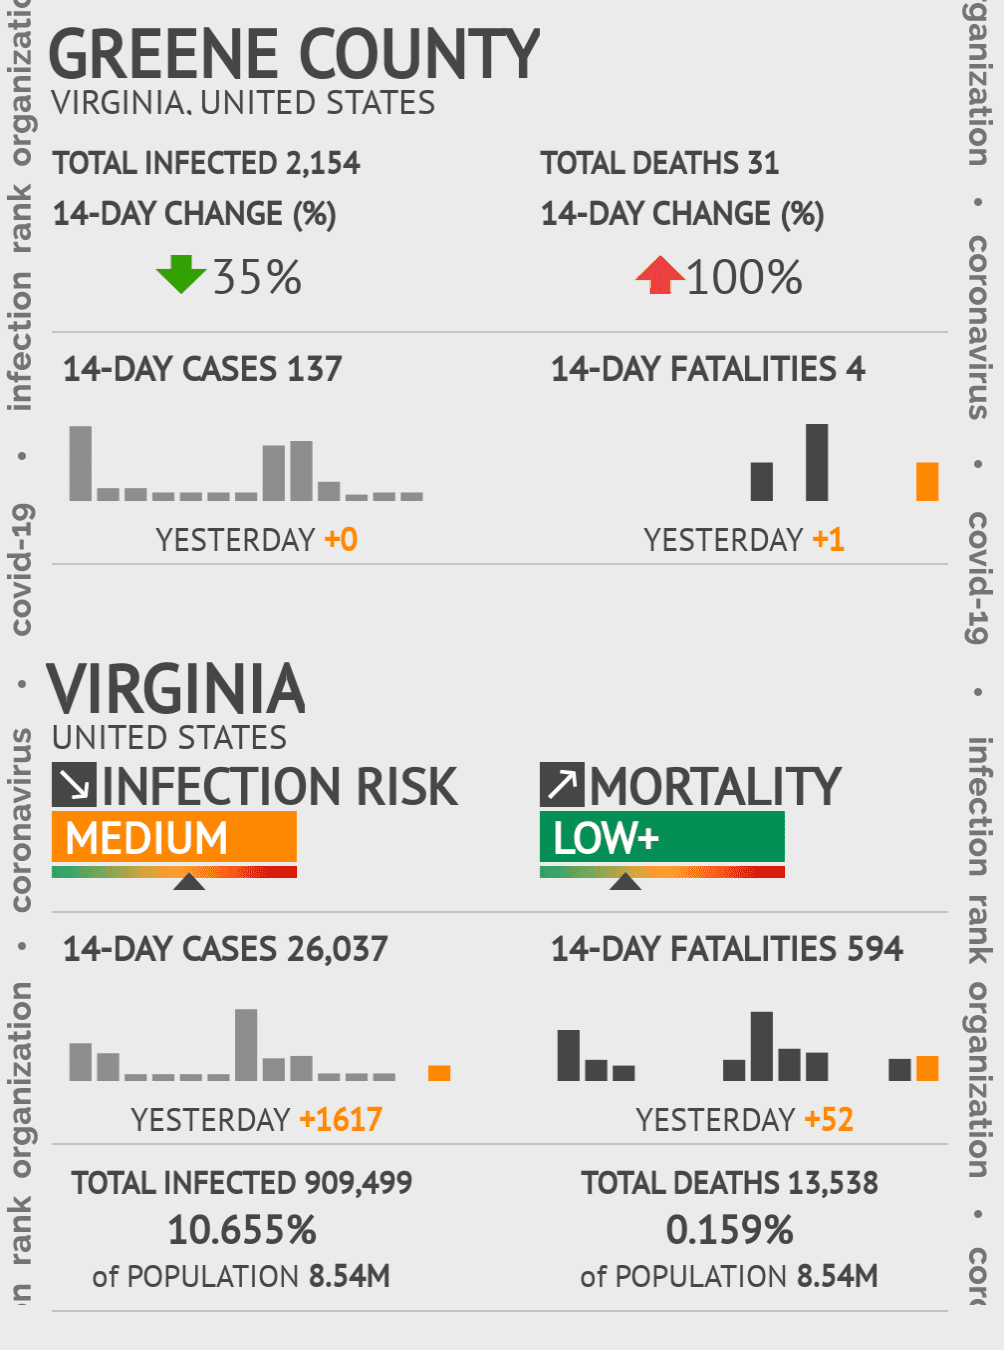 Greene County Coronavirus Covid-19 Risk of Infection on July 24, 2021